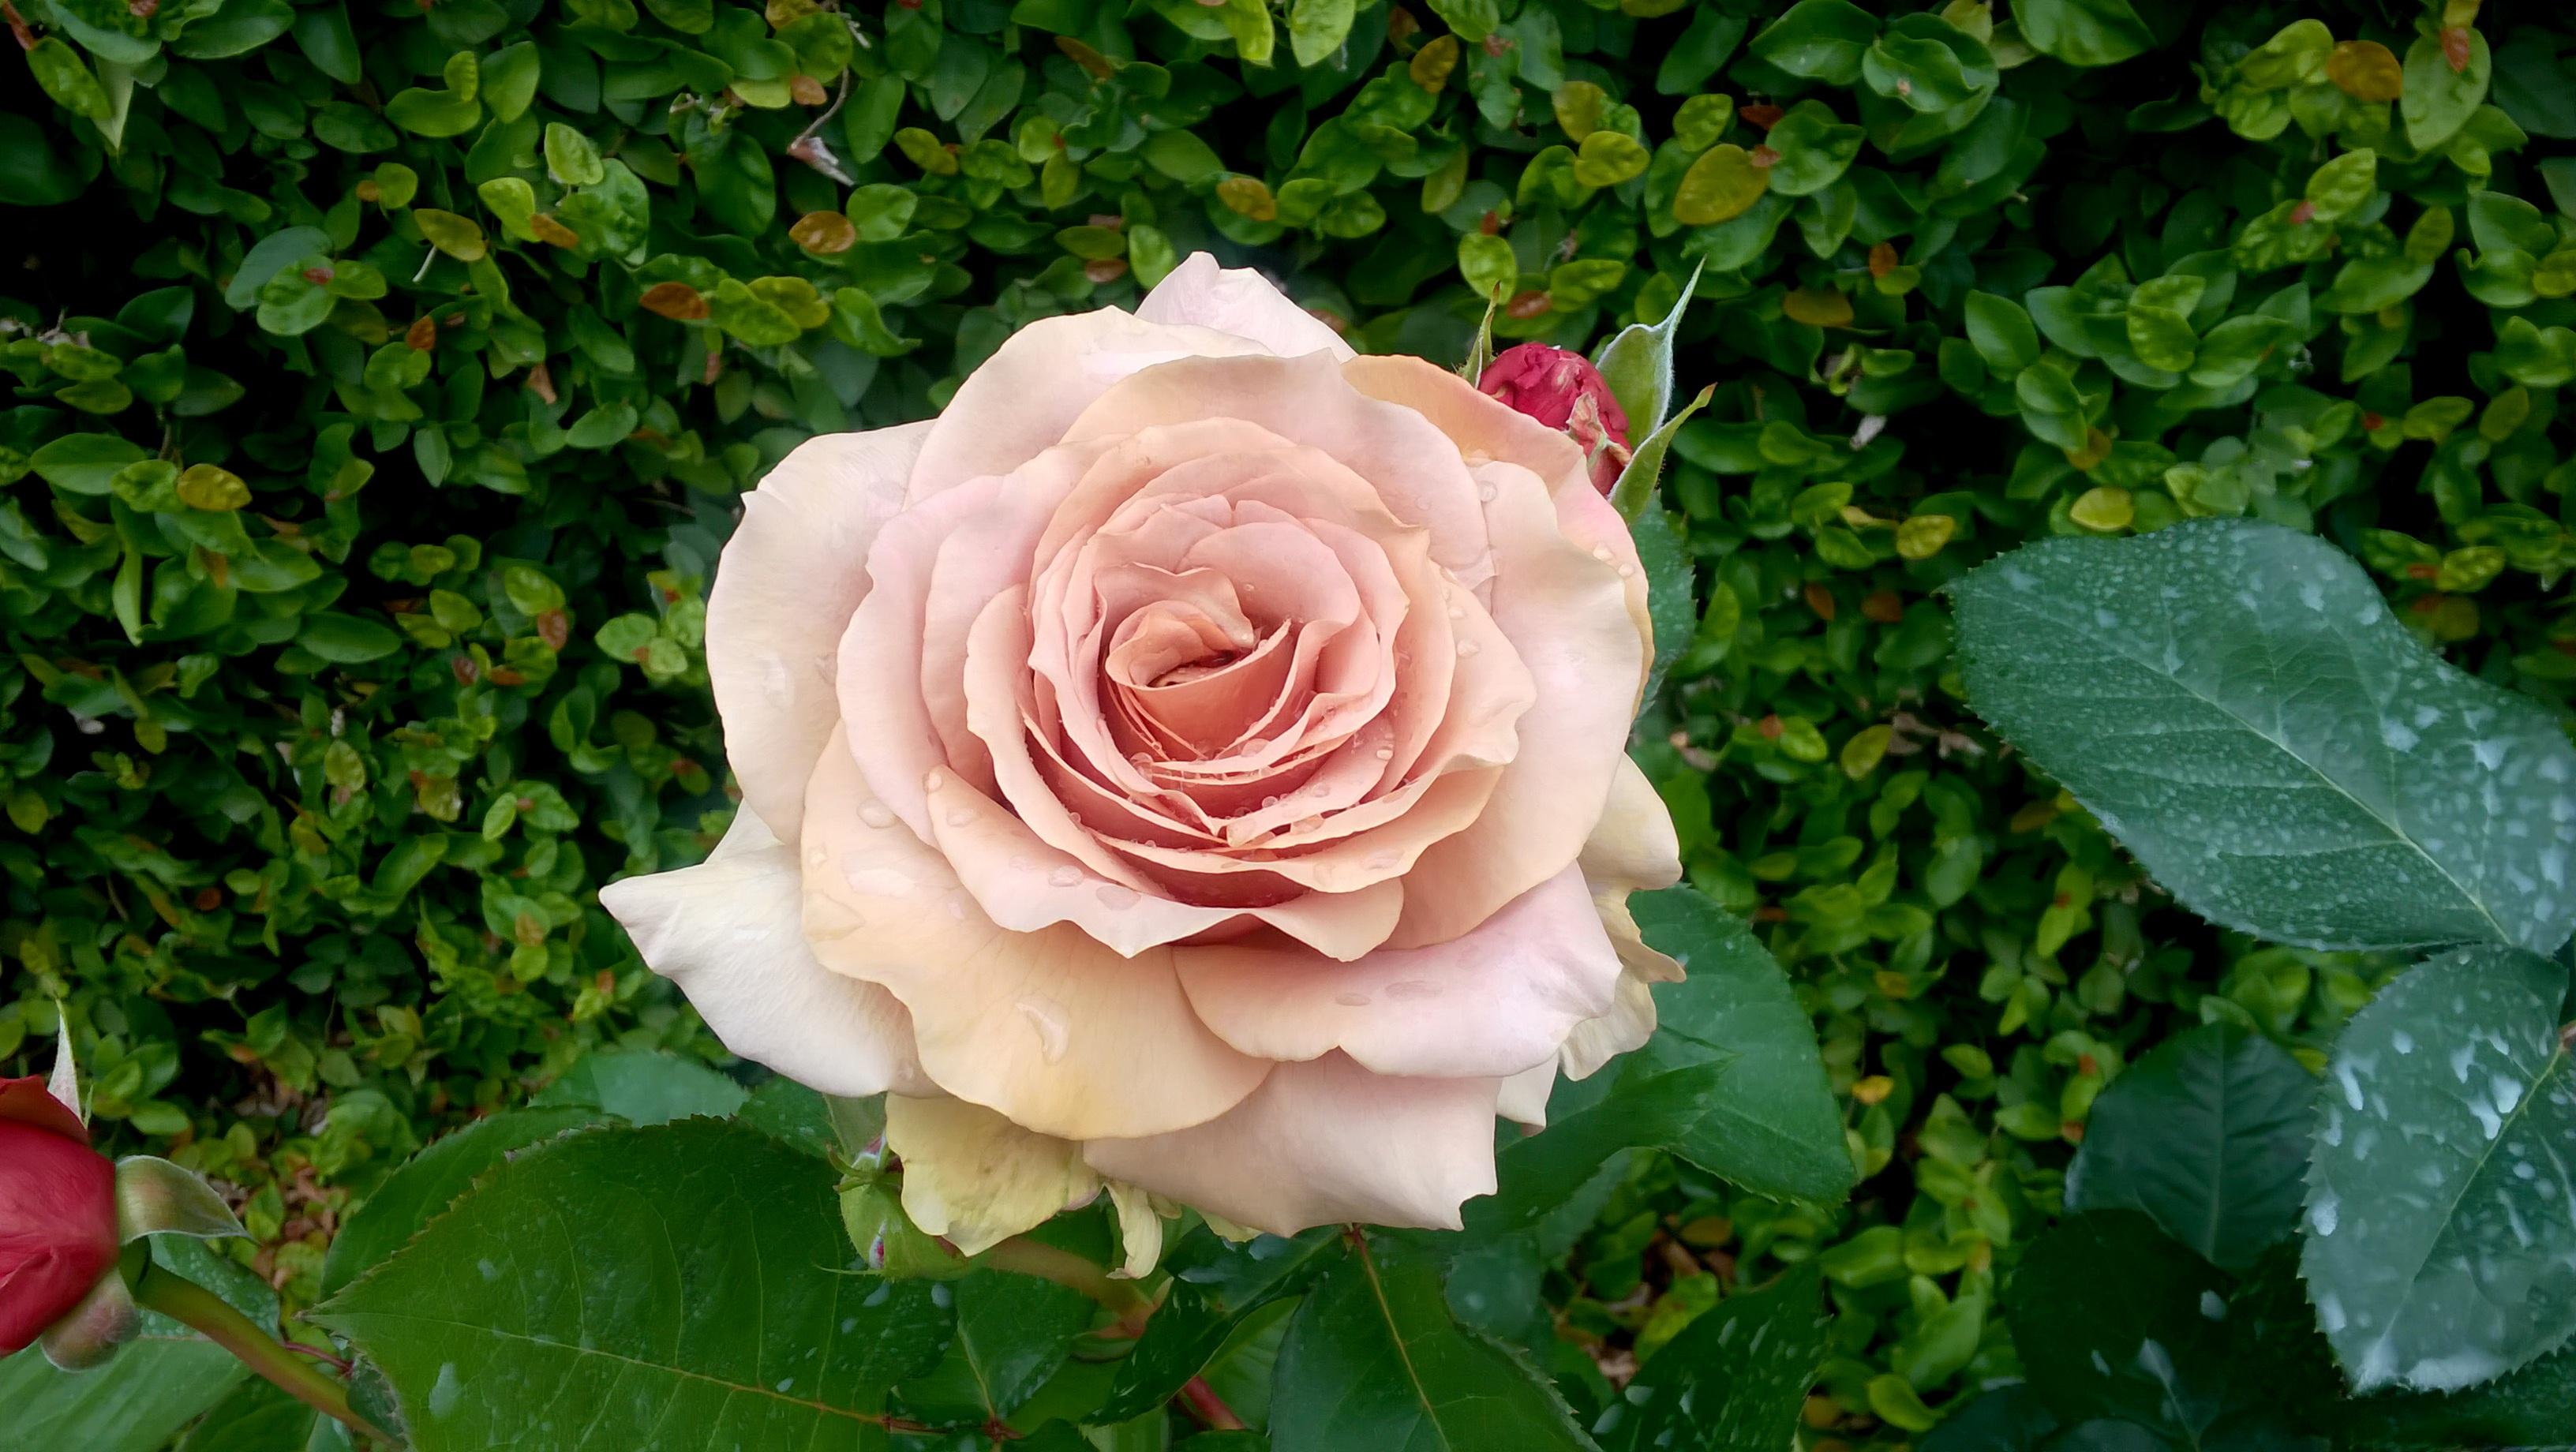 Kostenlose foto : Natur, Blütenblatt, blühen, Geschenk, Grün, rot ...